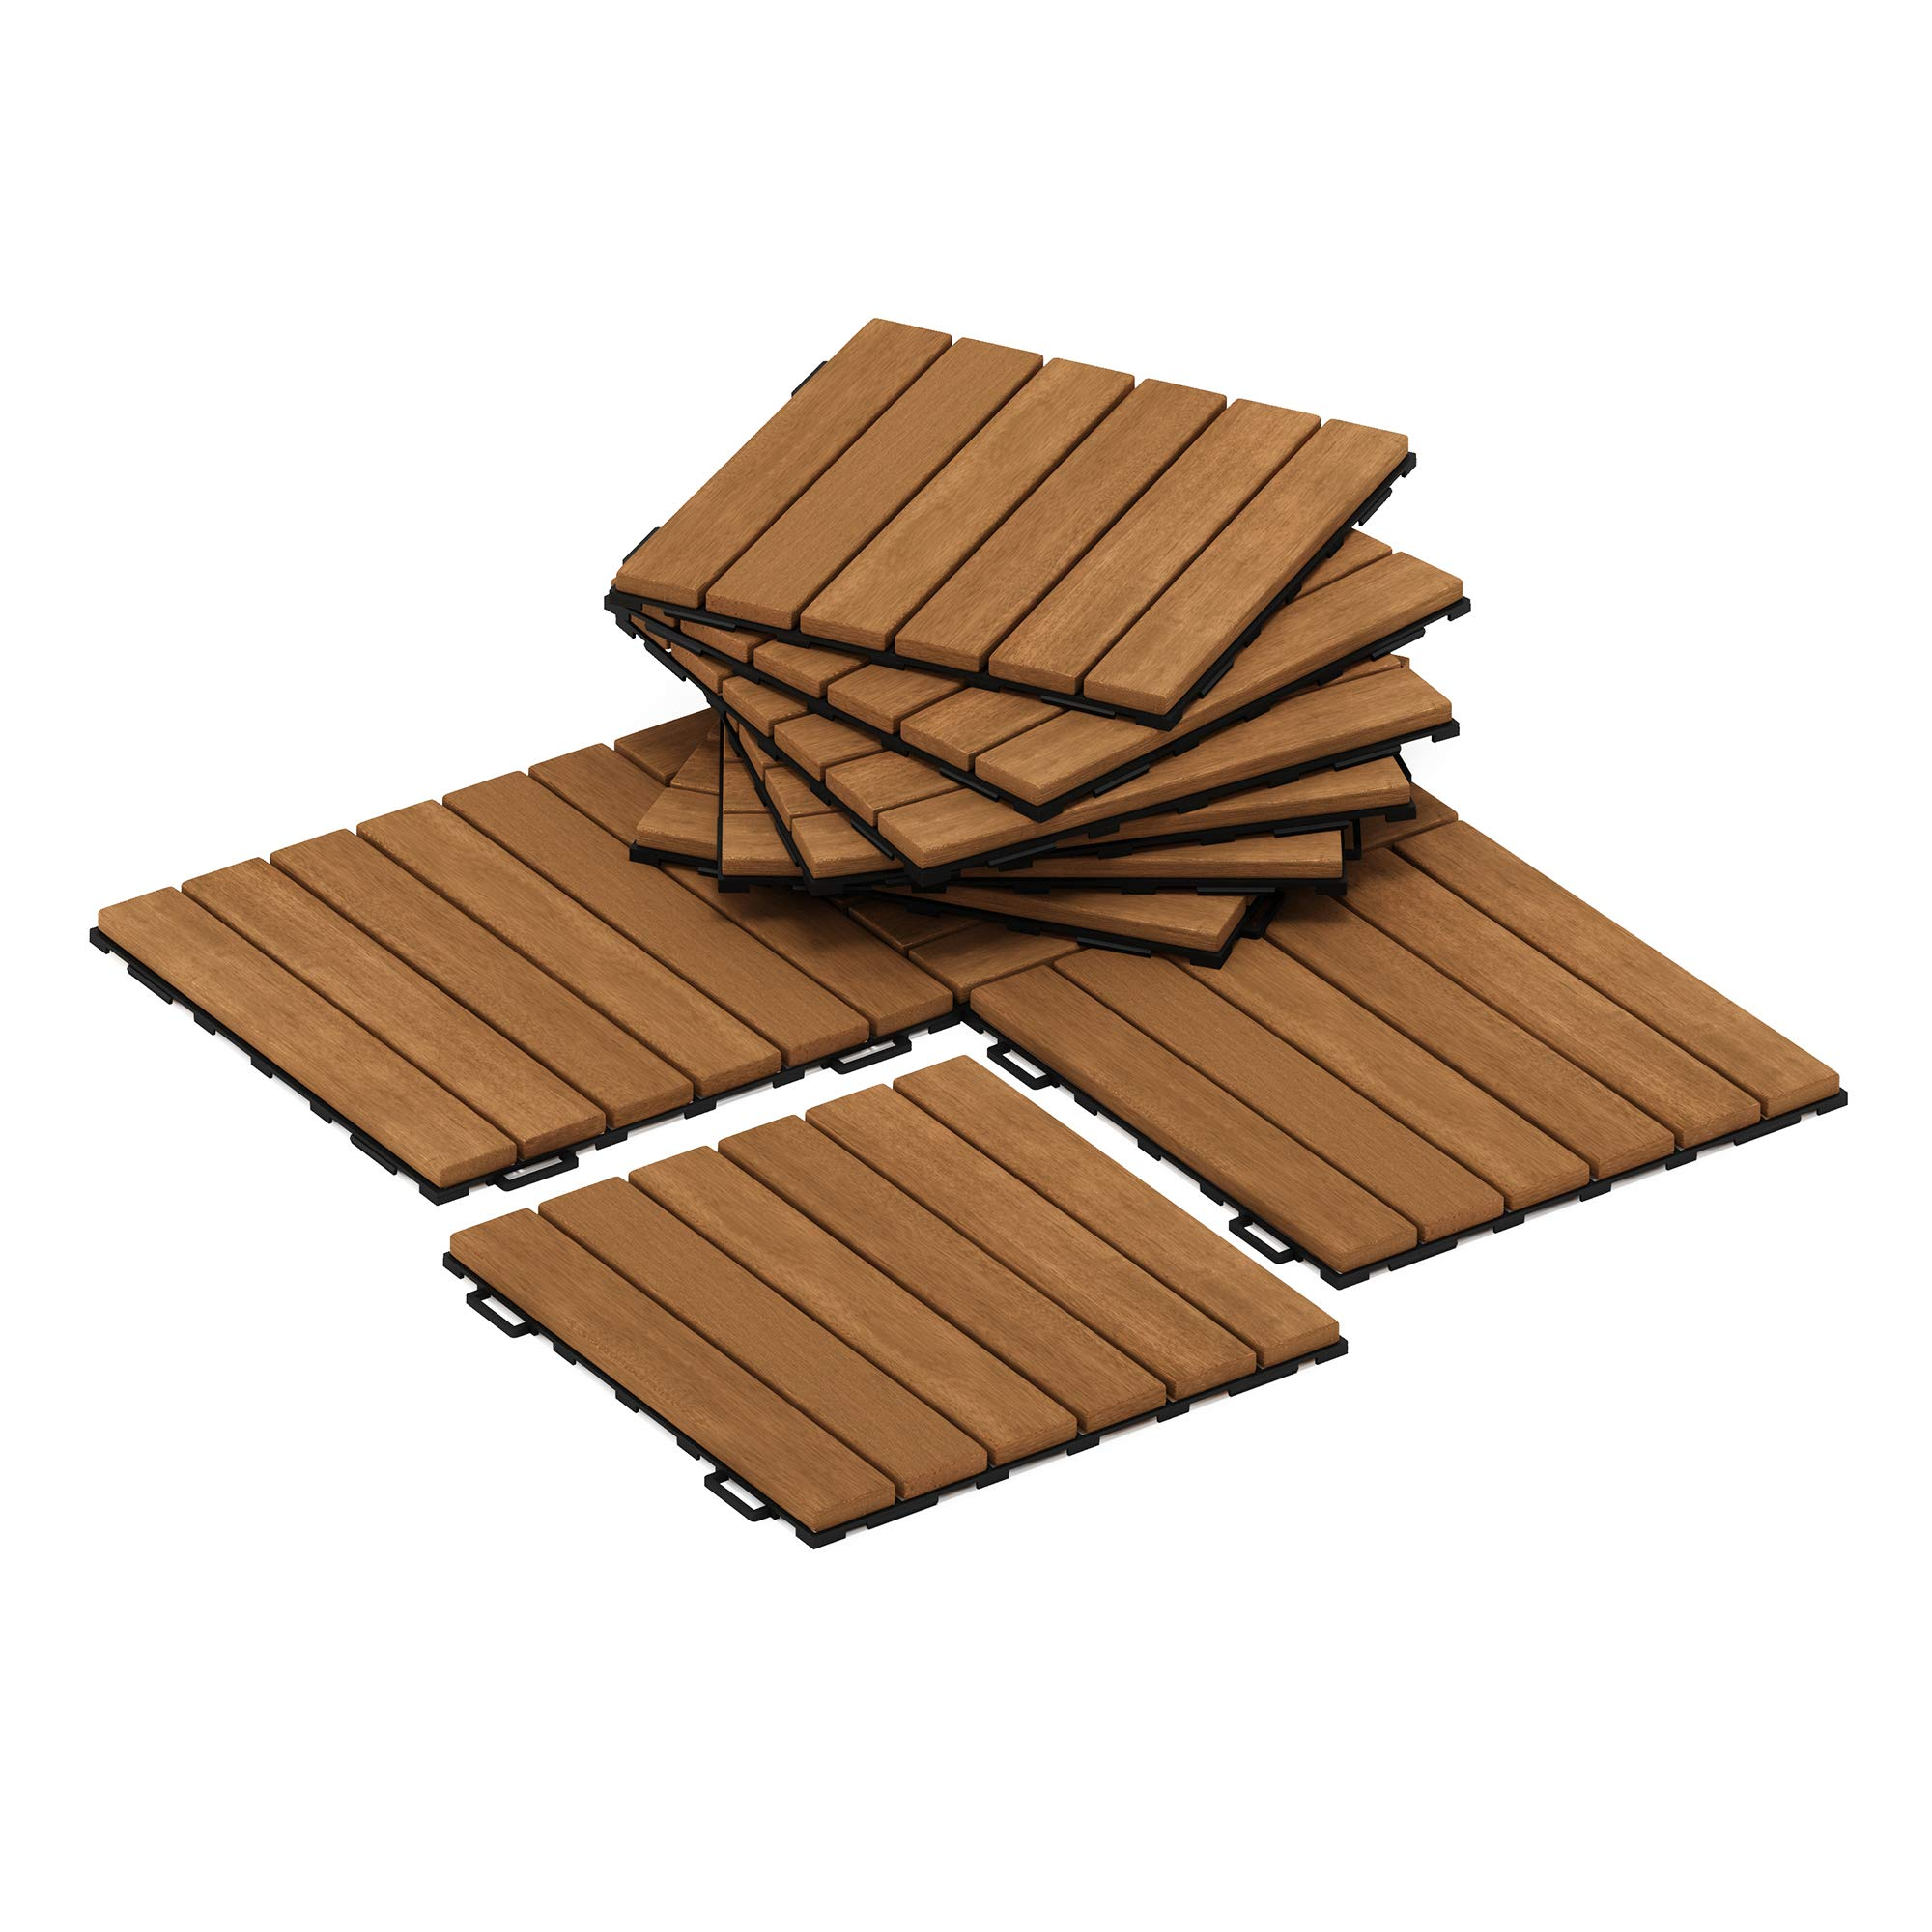 Furinno FG181034 Tioman Hardwood Patio Furniture Floor Decking Wood Tile, Natural